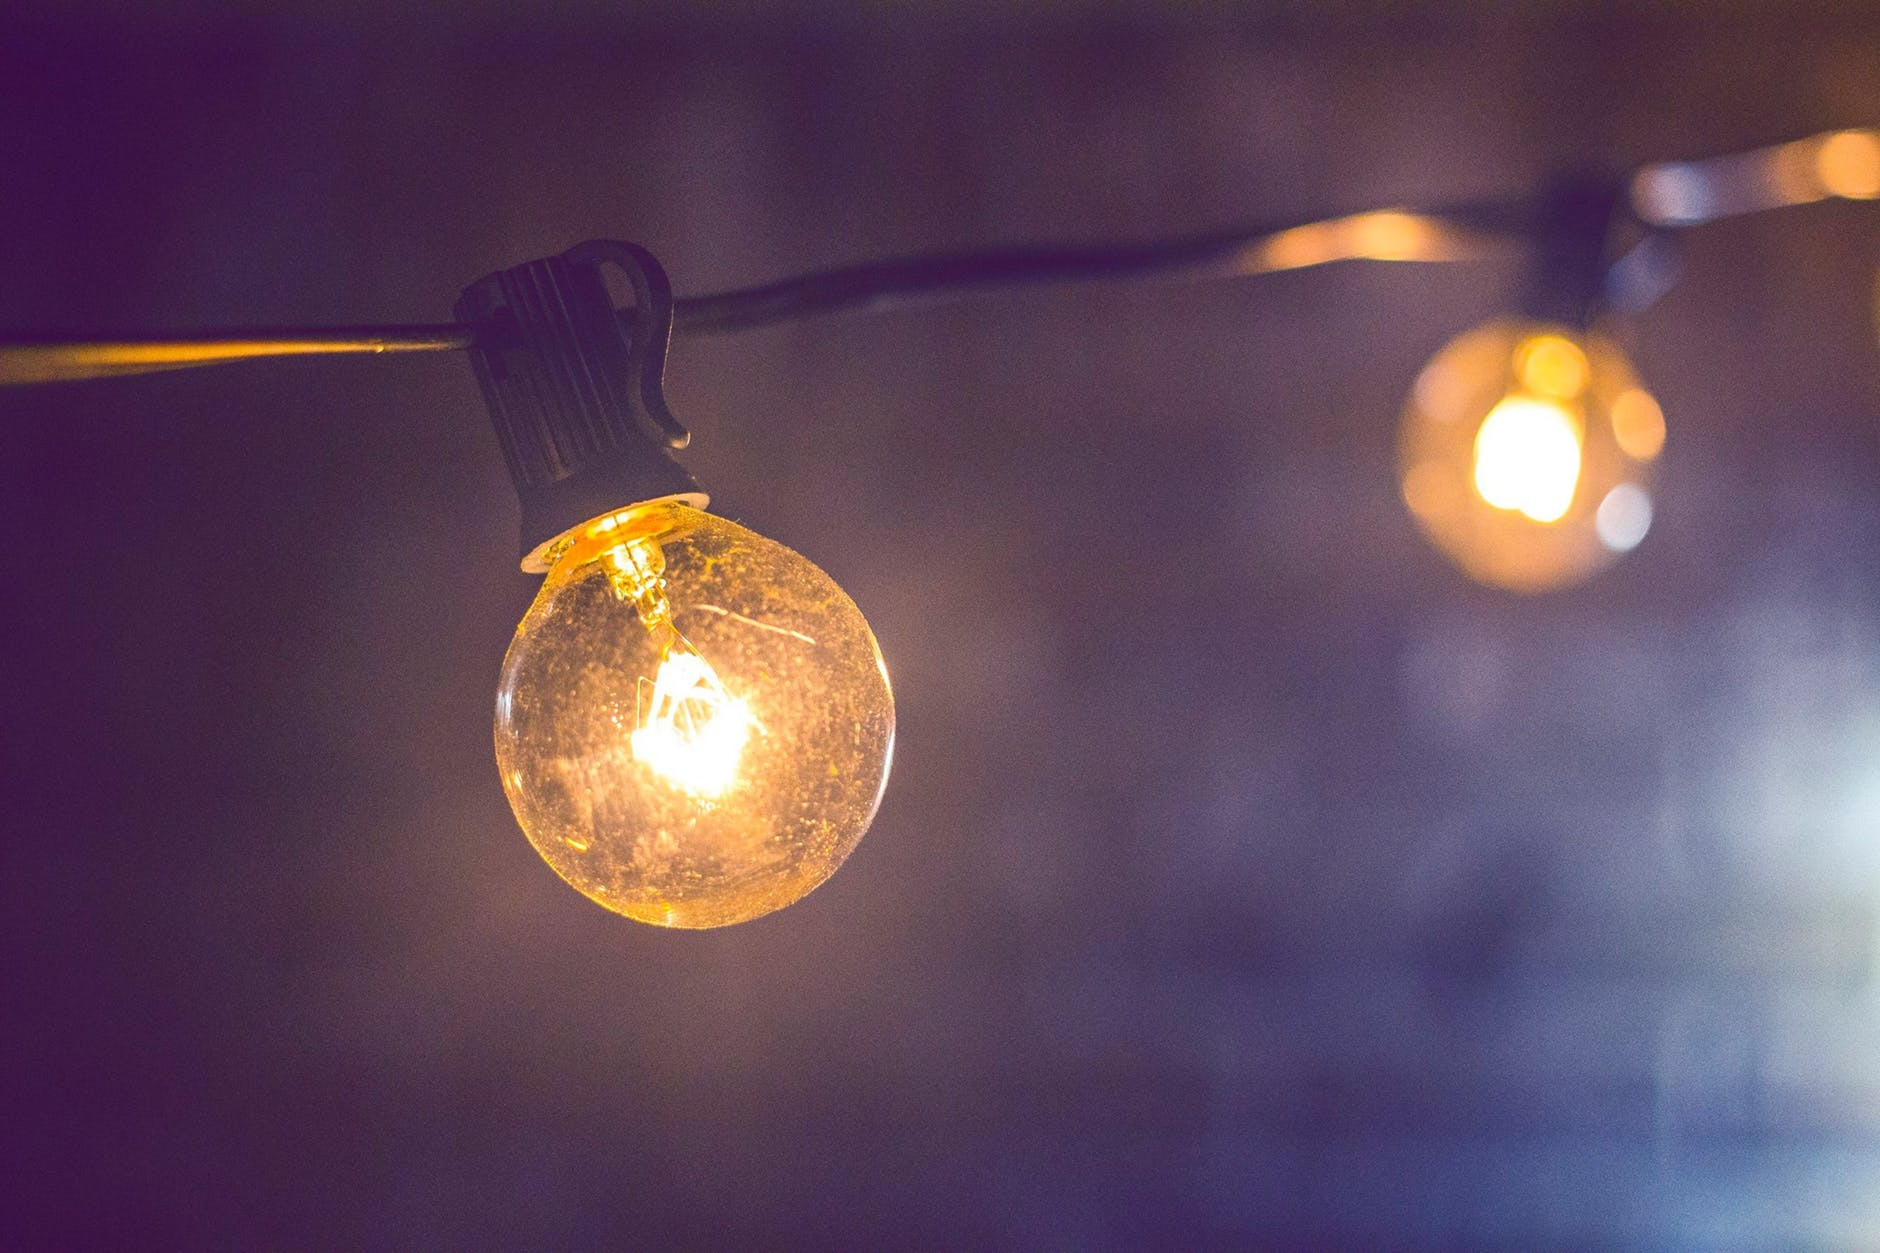 Fairy lights with big bulbs hung across a room